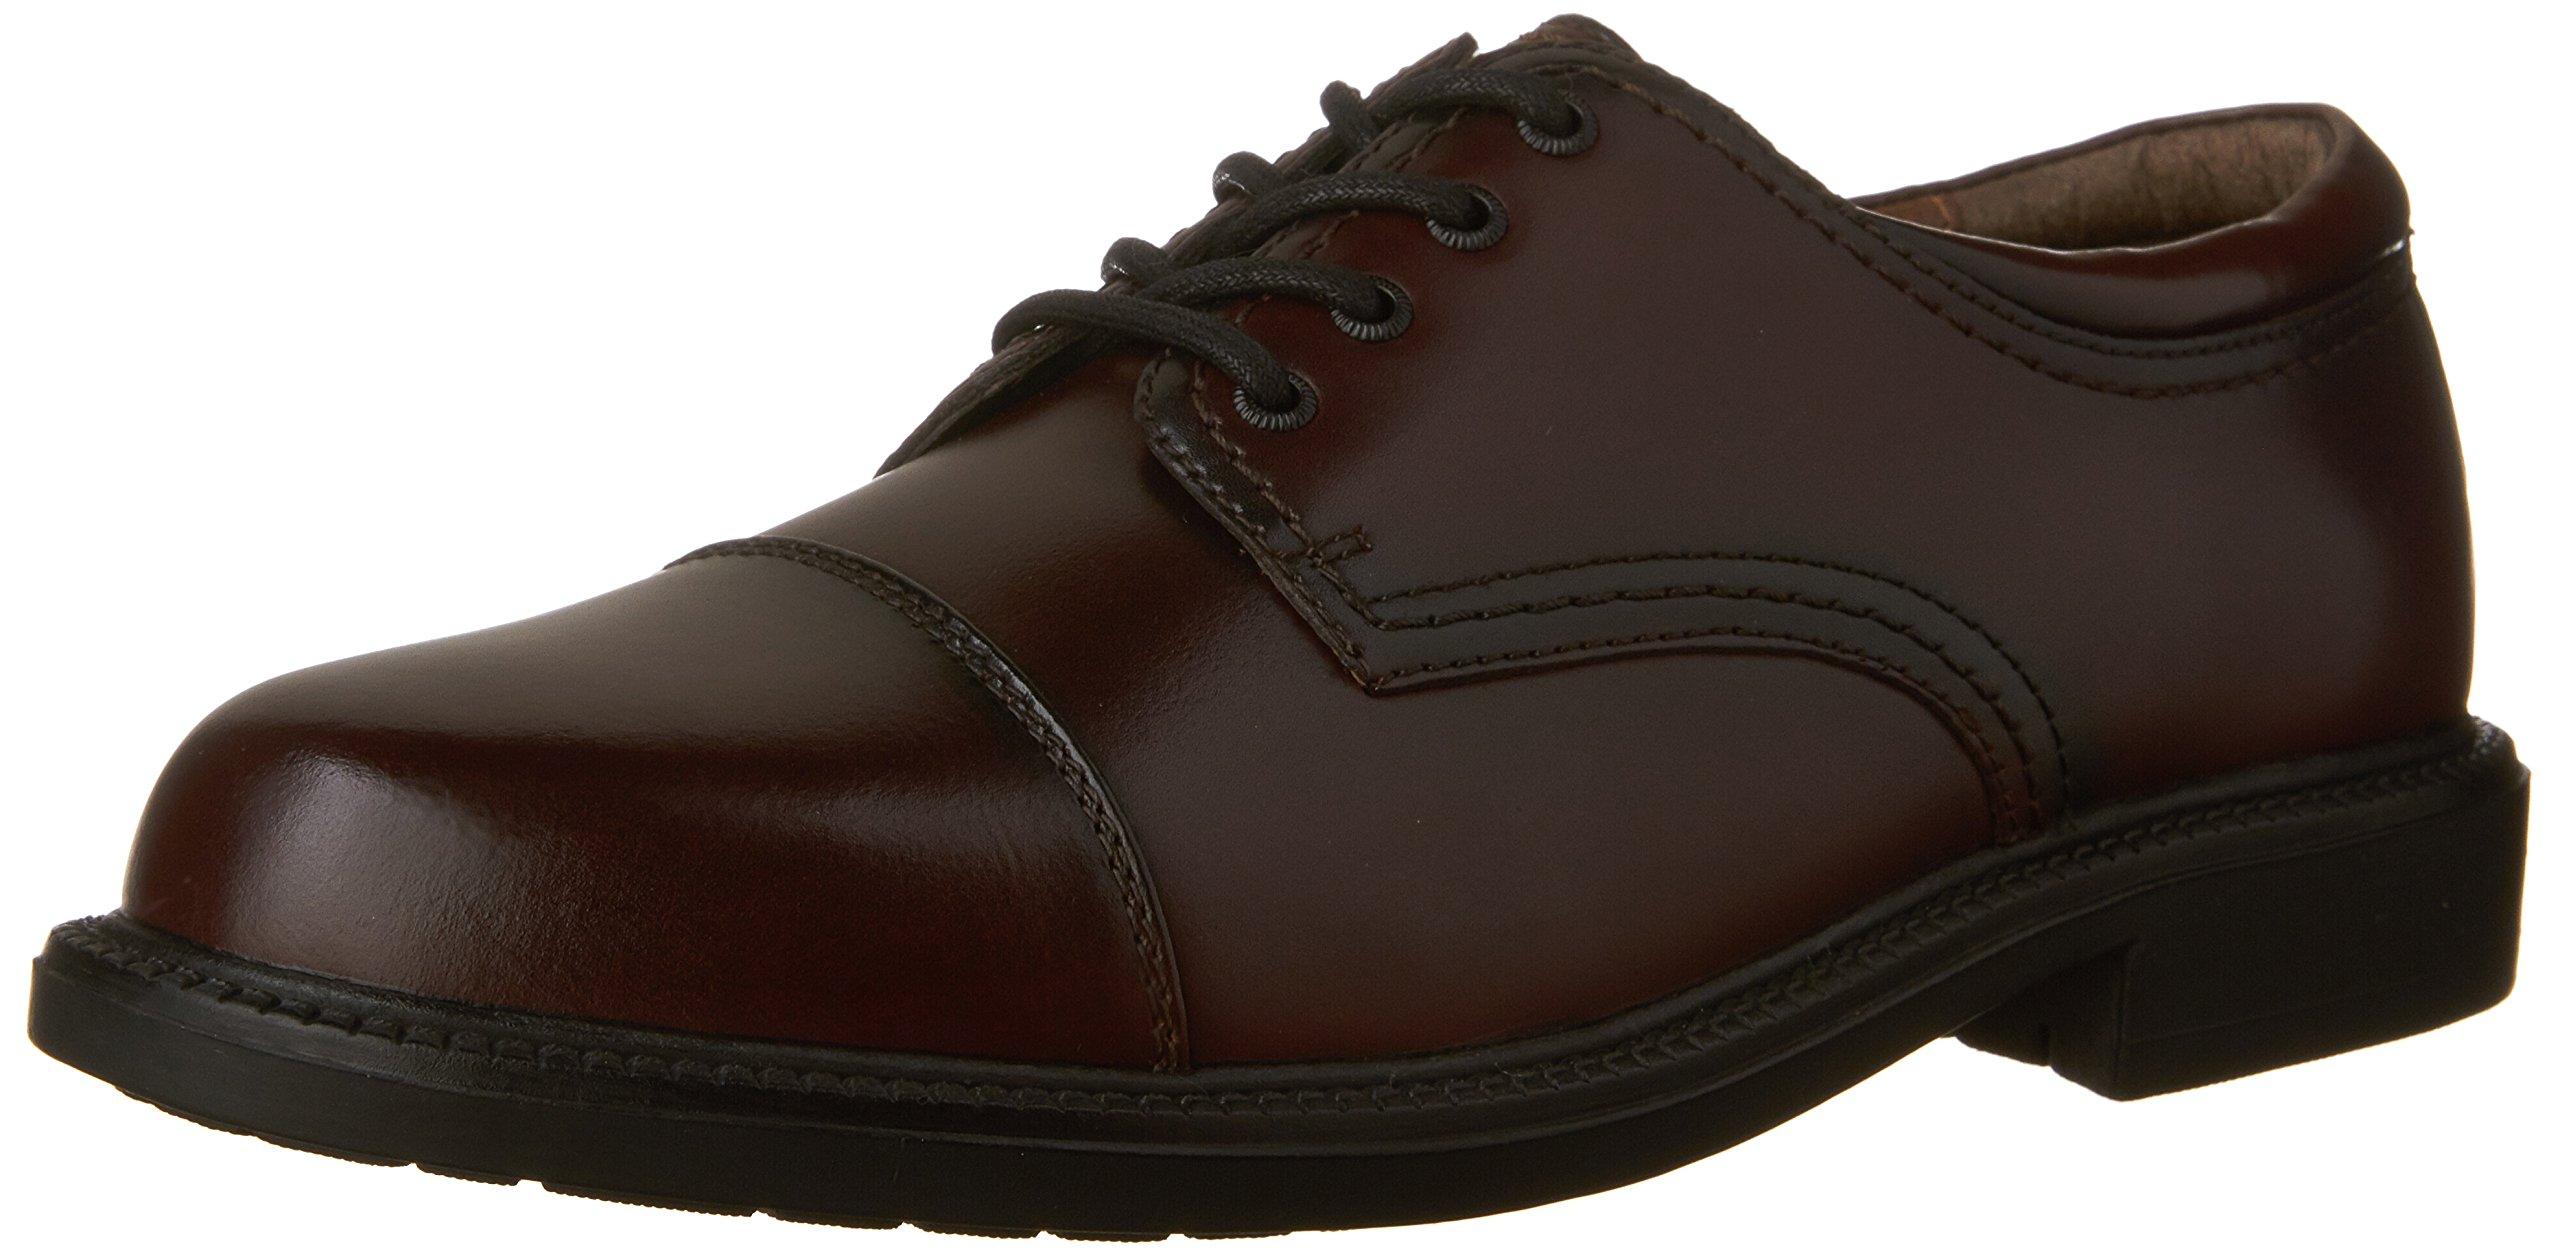 Dockers Men's Gordon Leather Oxford Dress Shoe,Cordovan,12 W US